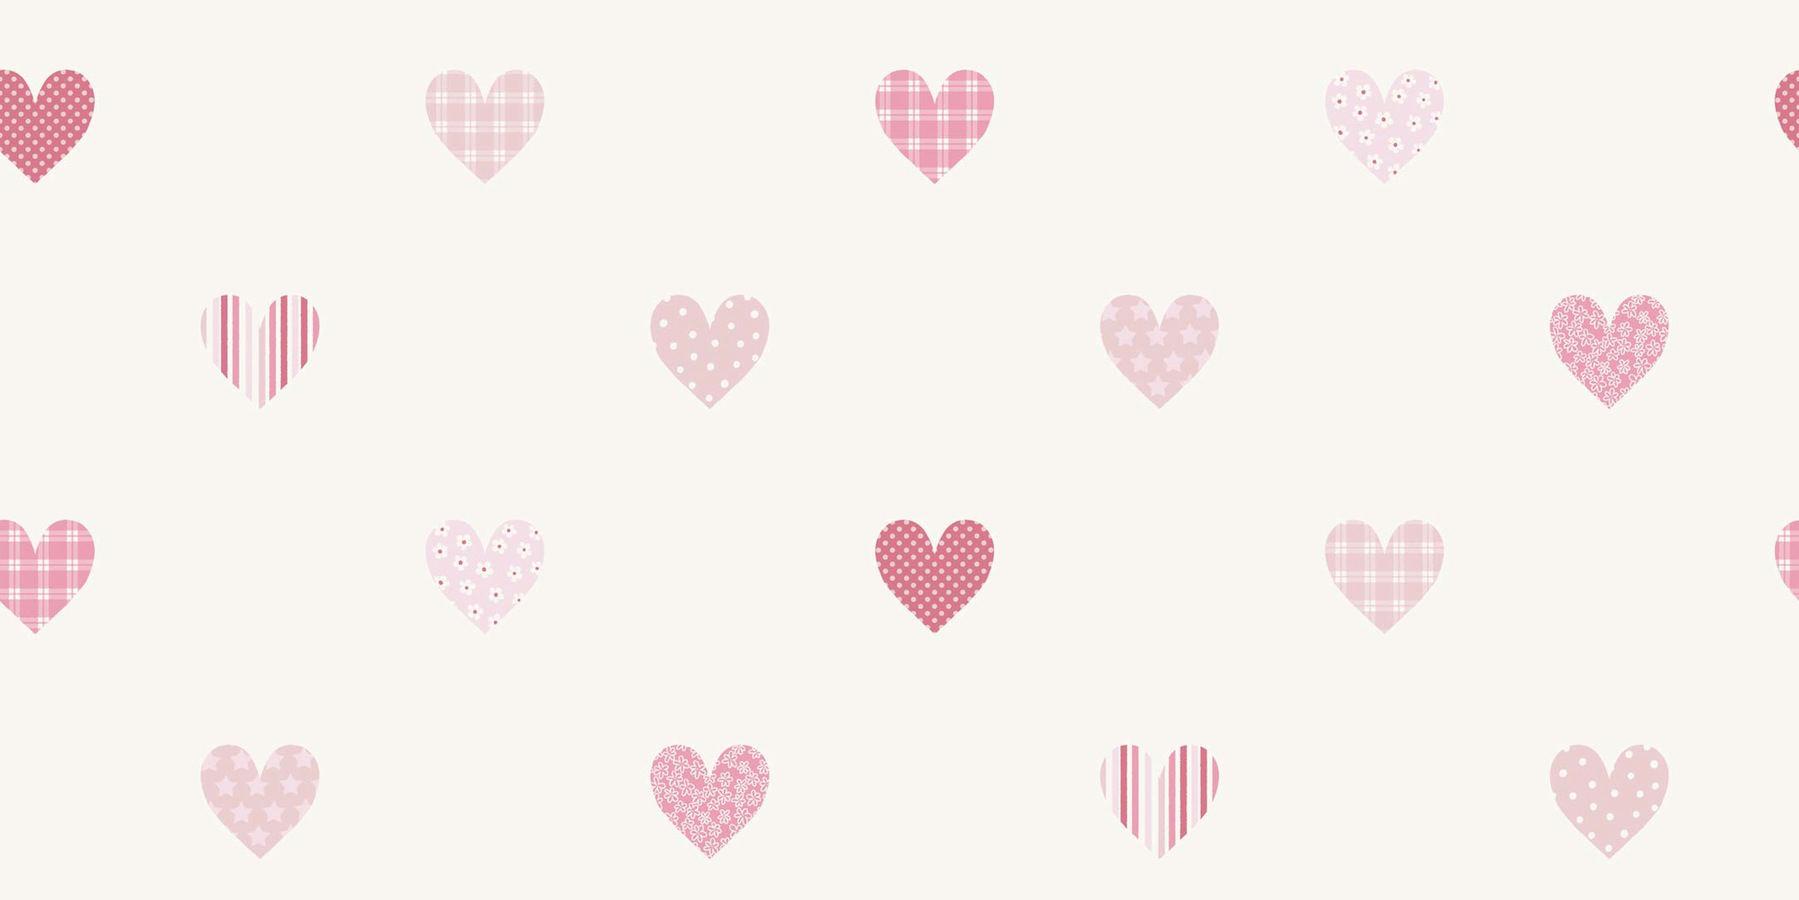 Papel pintado infantil corazones estampados en fresas for Papel pintado para paredes 3d